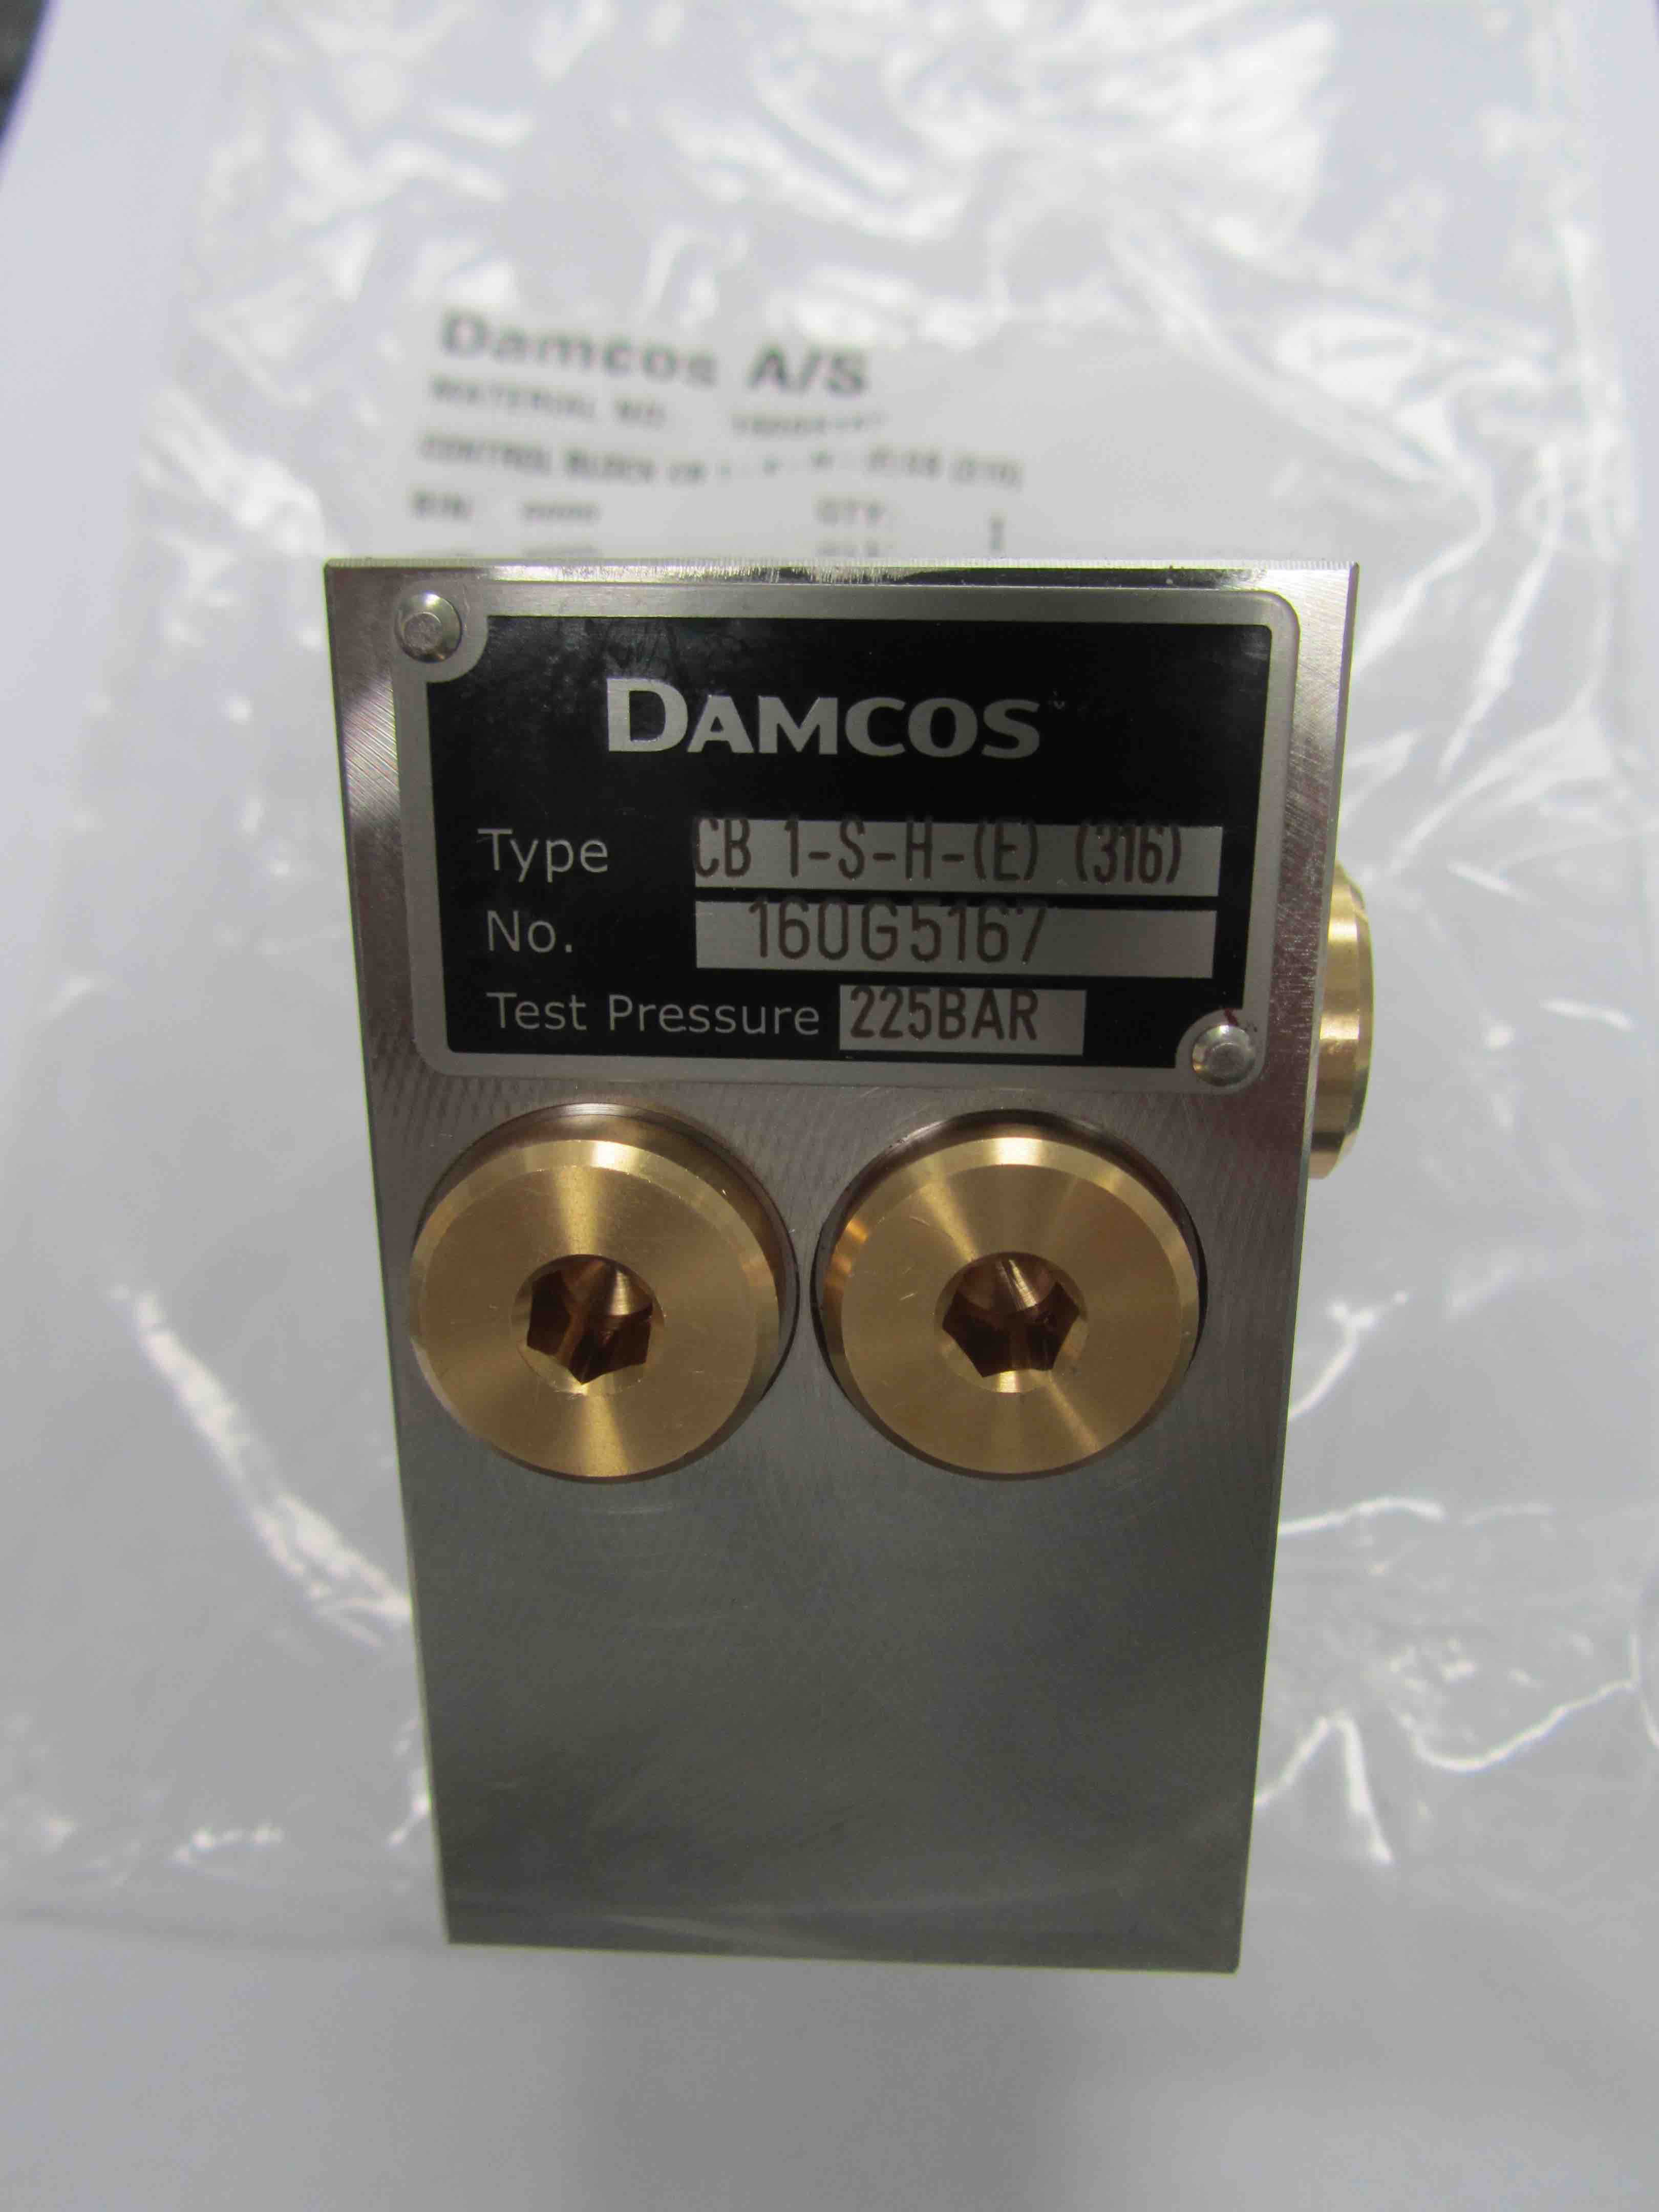 Damcos 160G5167